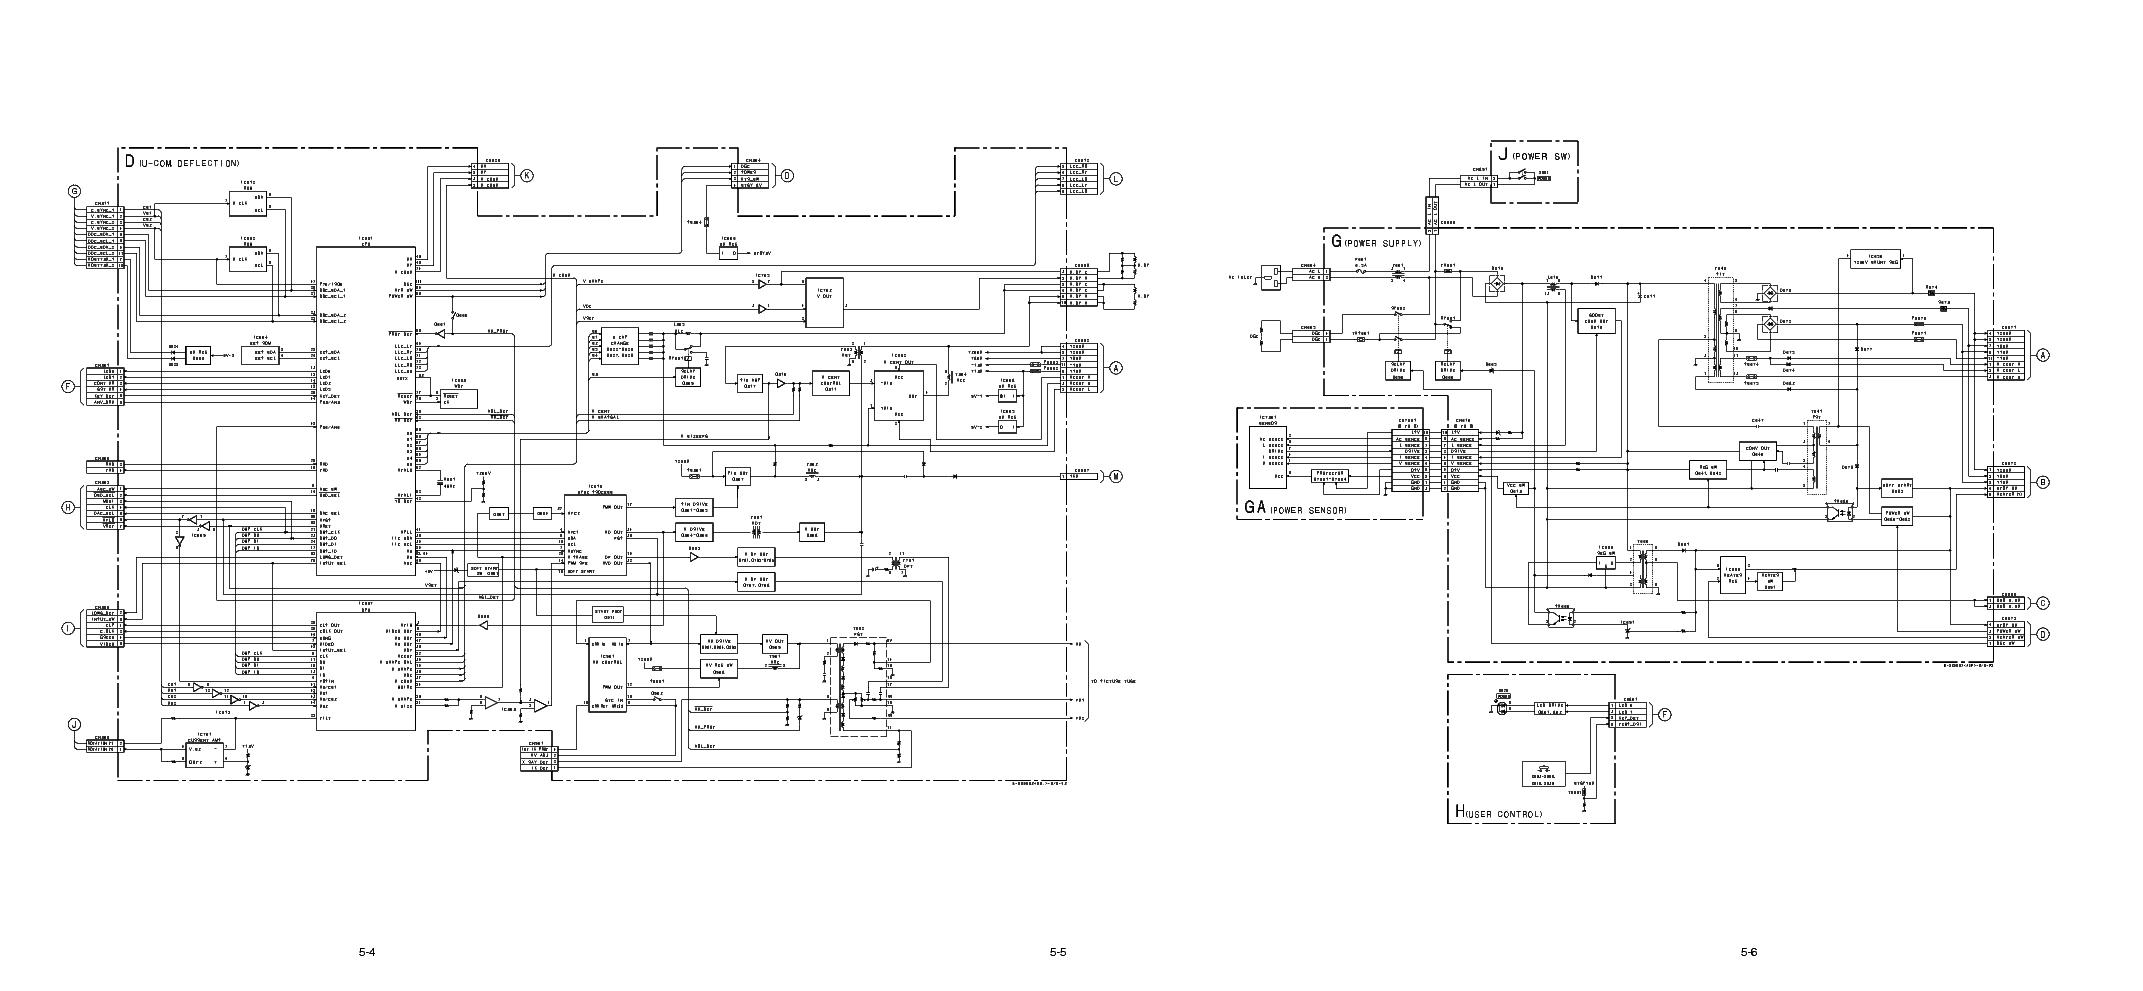 Ibm 6558